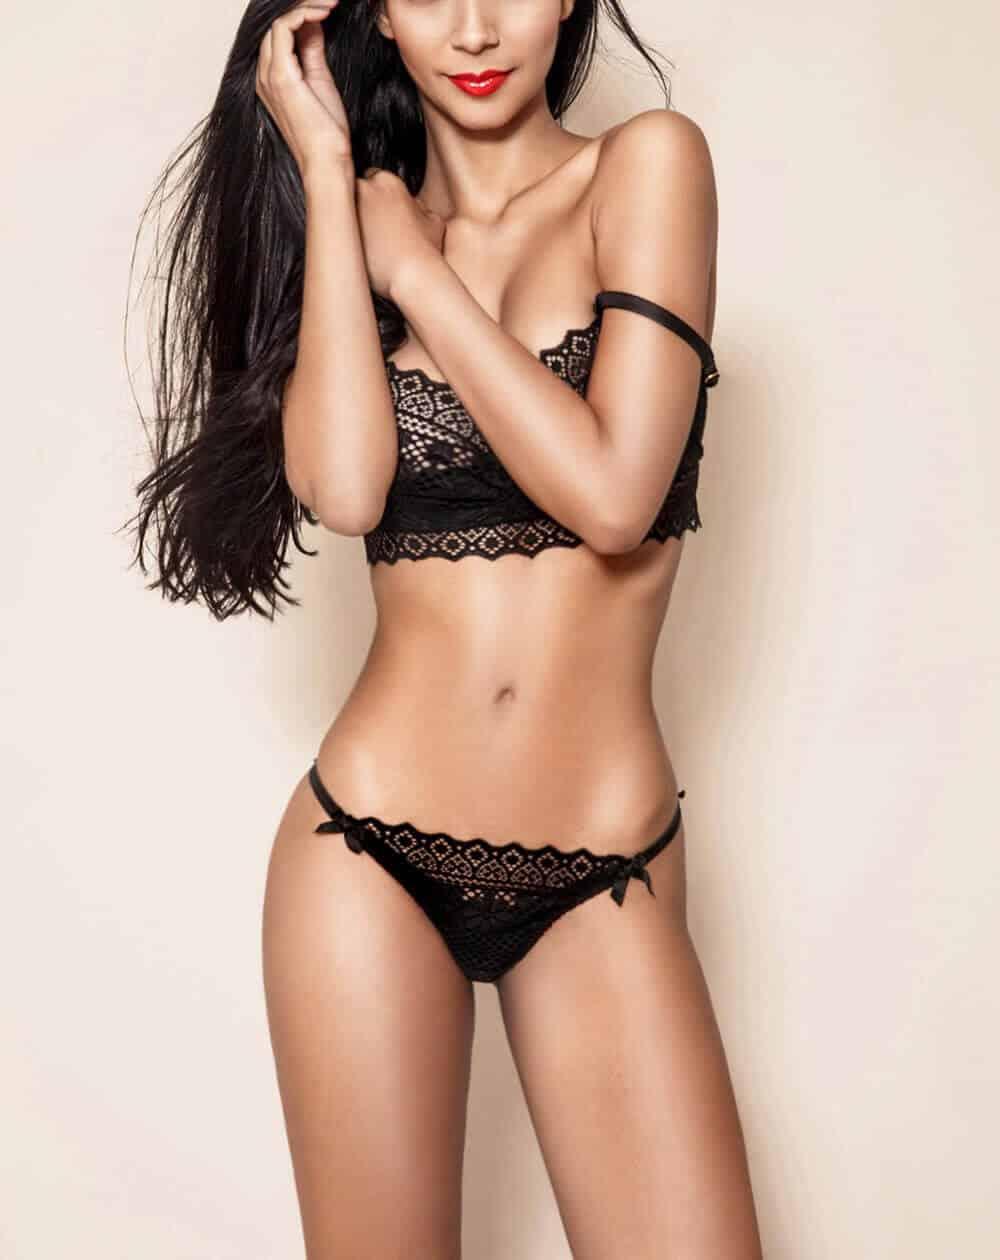 Tall, Slim Brazilian Model Escort Tessalya